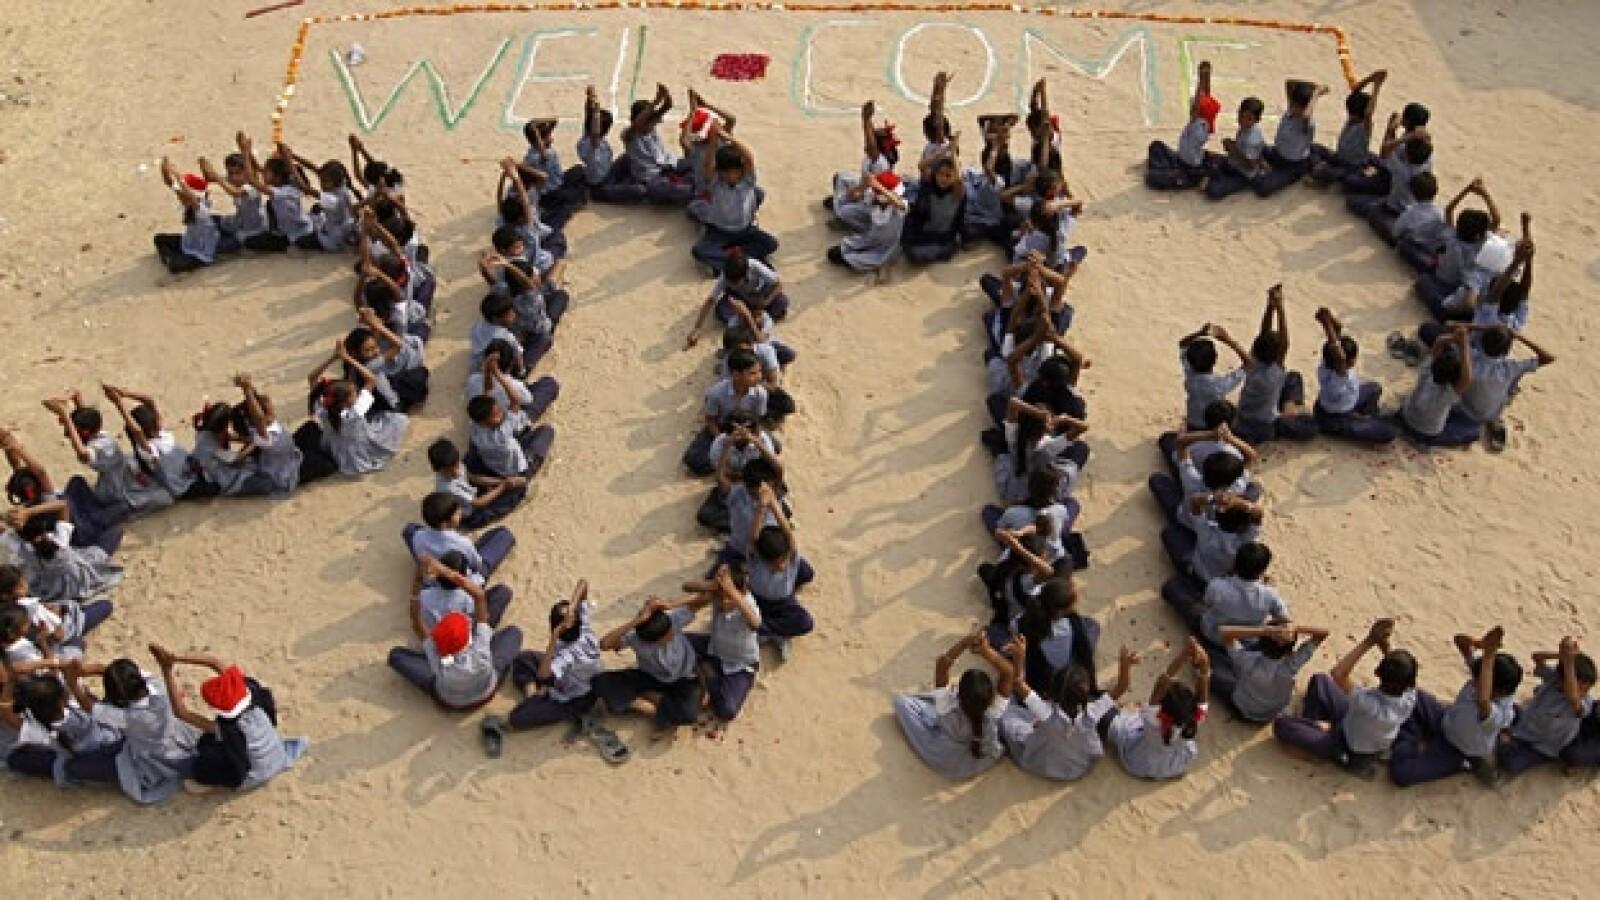 año nuevo 2011 2011 celebracion india